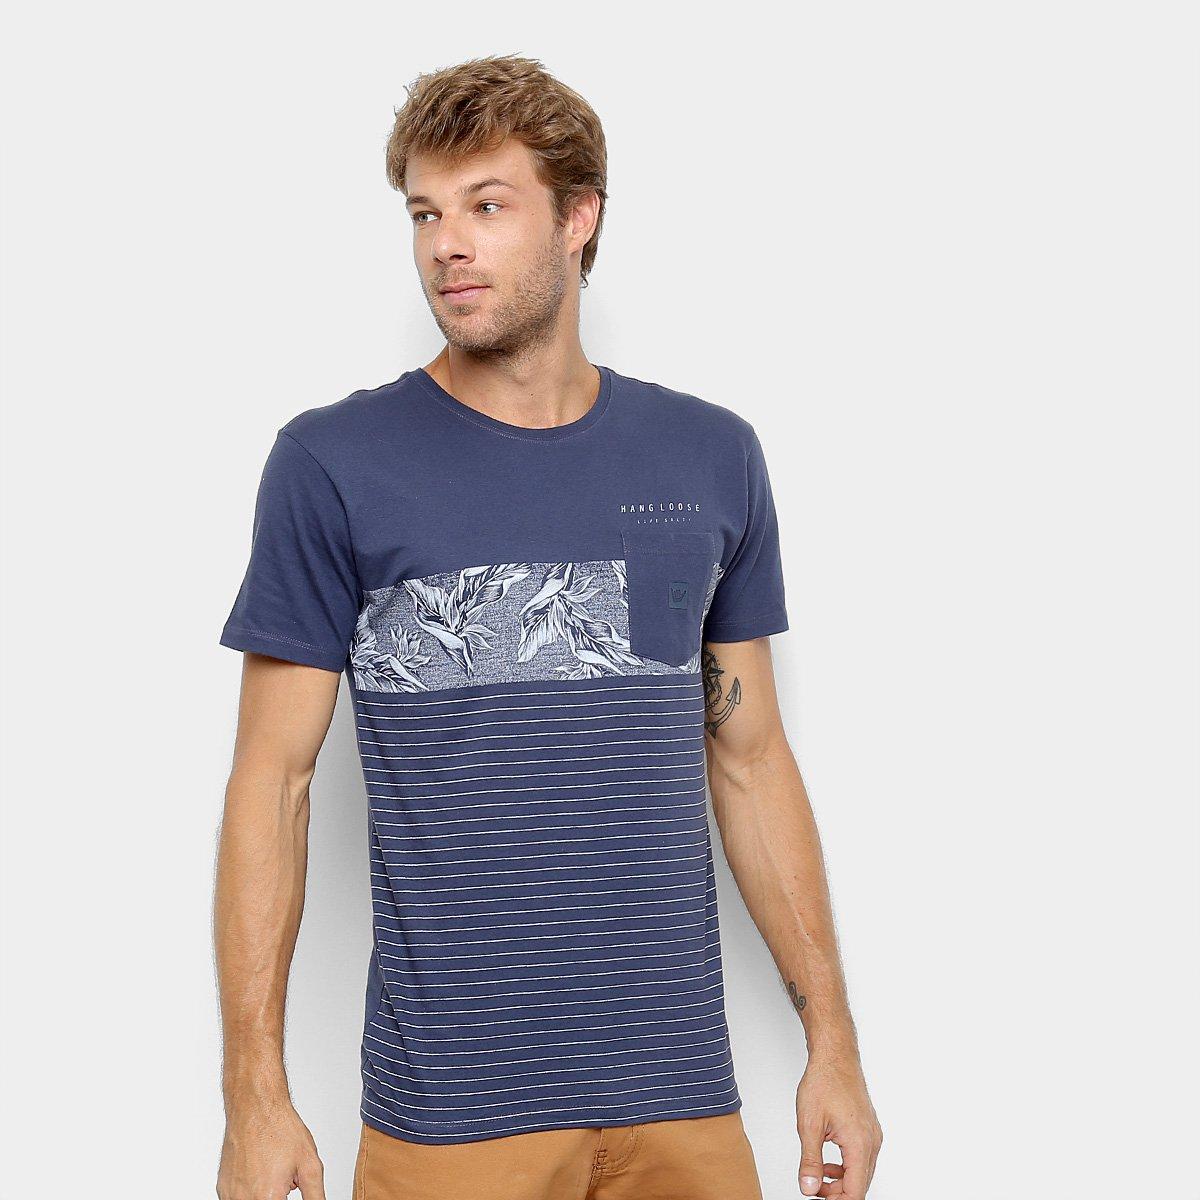 937f0b5ace1 Camiseta Hang Loose Estampada Tropico Masculina